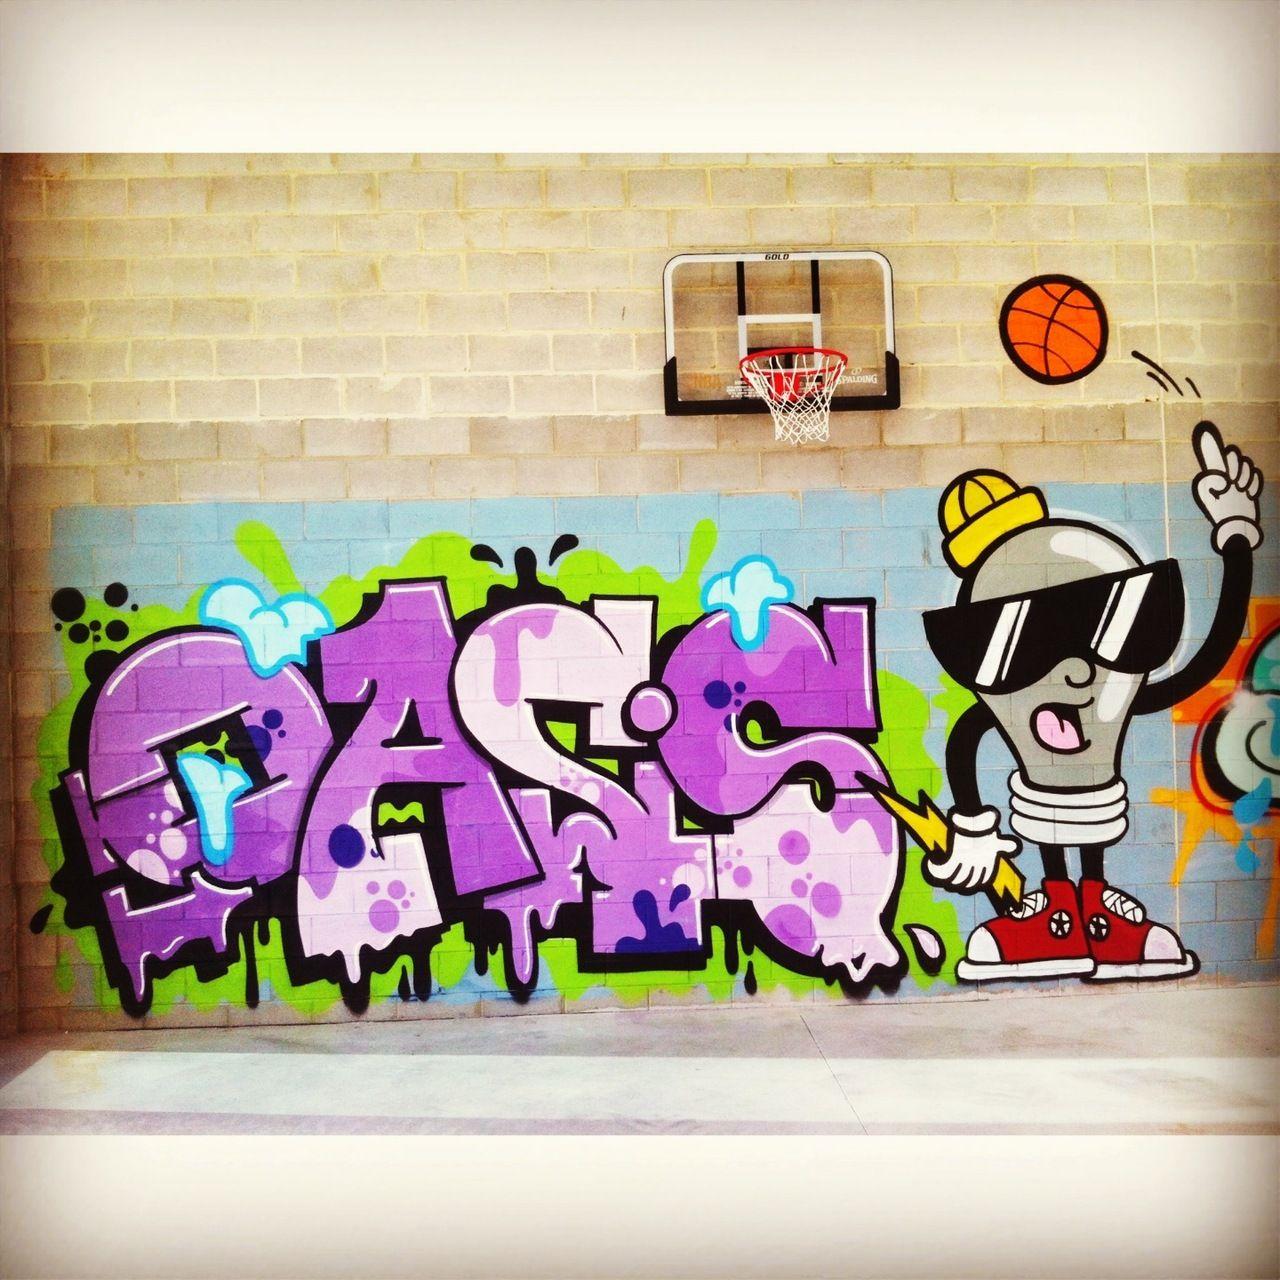 Картинки уроки граффити